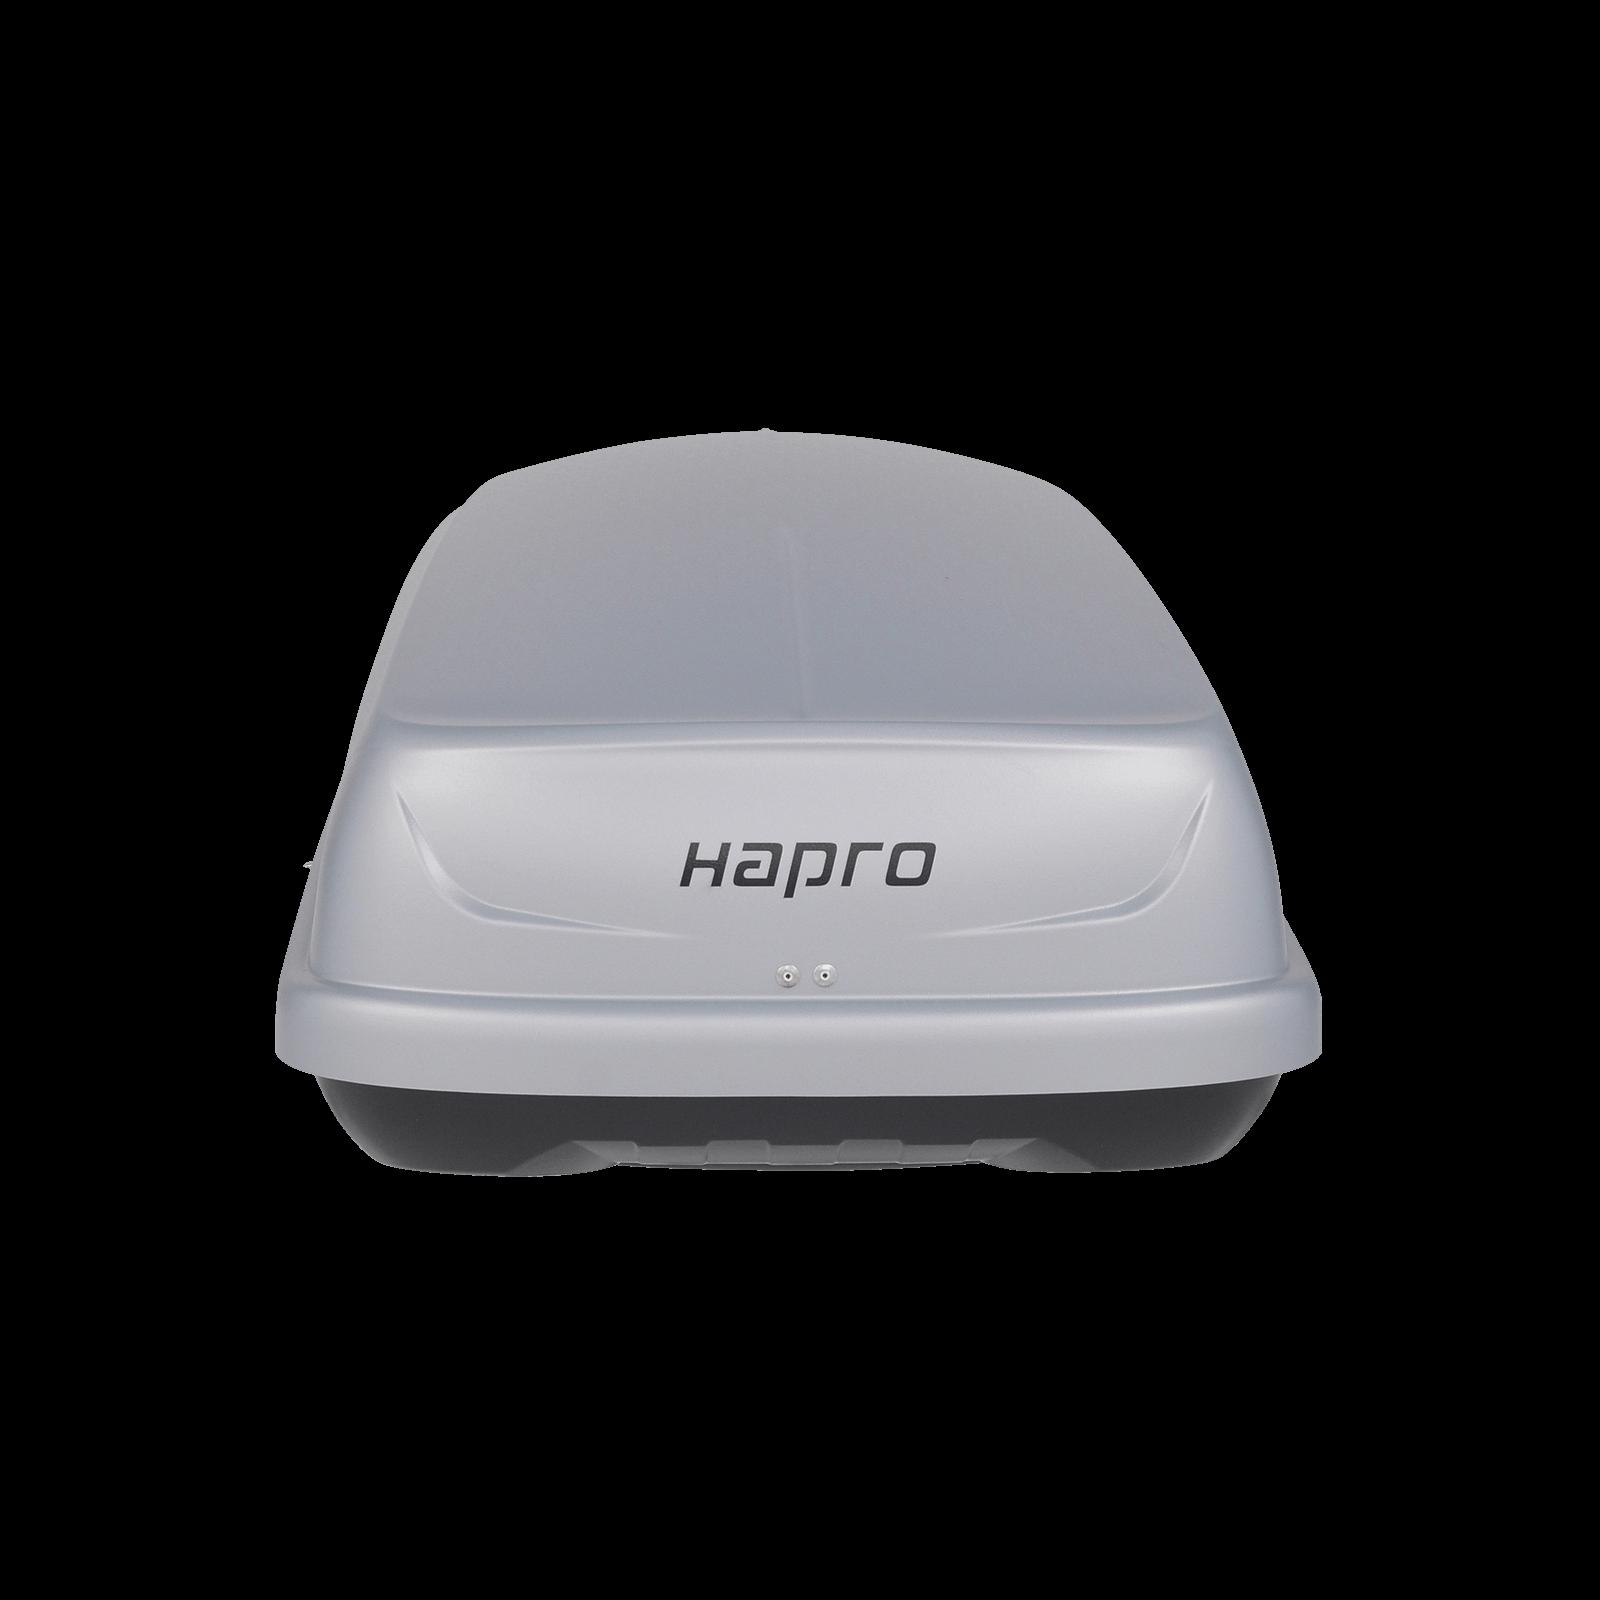 Dachbox Hapro Traxer 5.6 SilverGrey - Bild 4